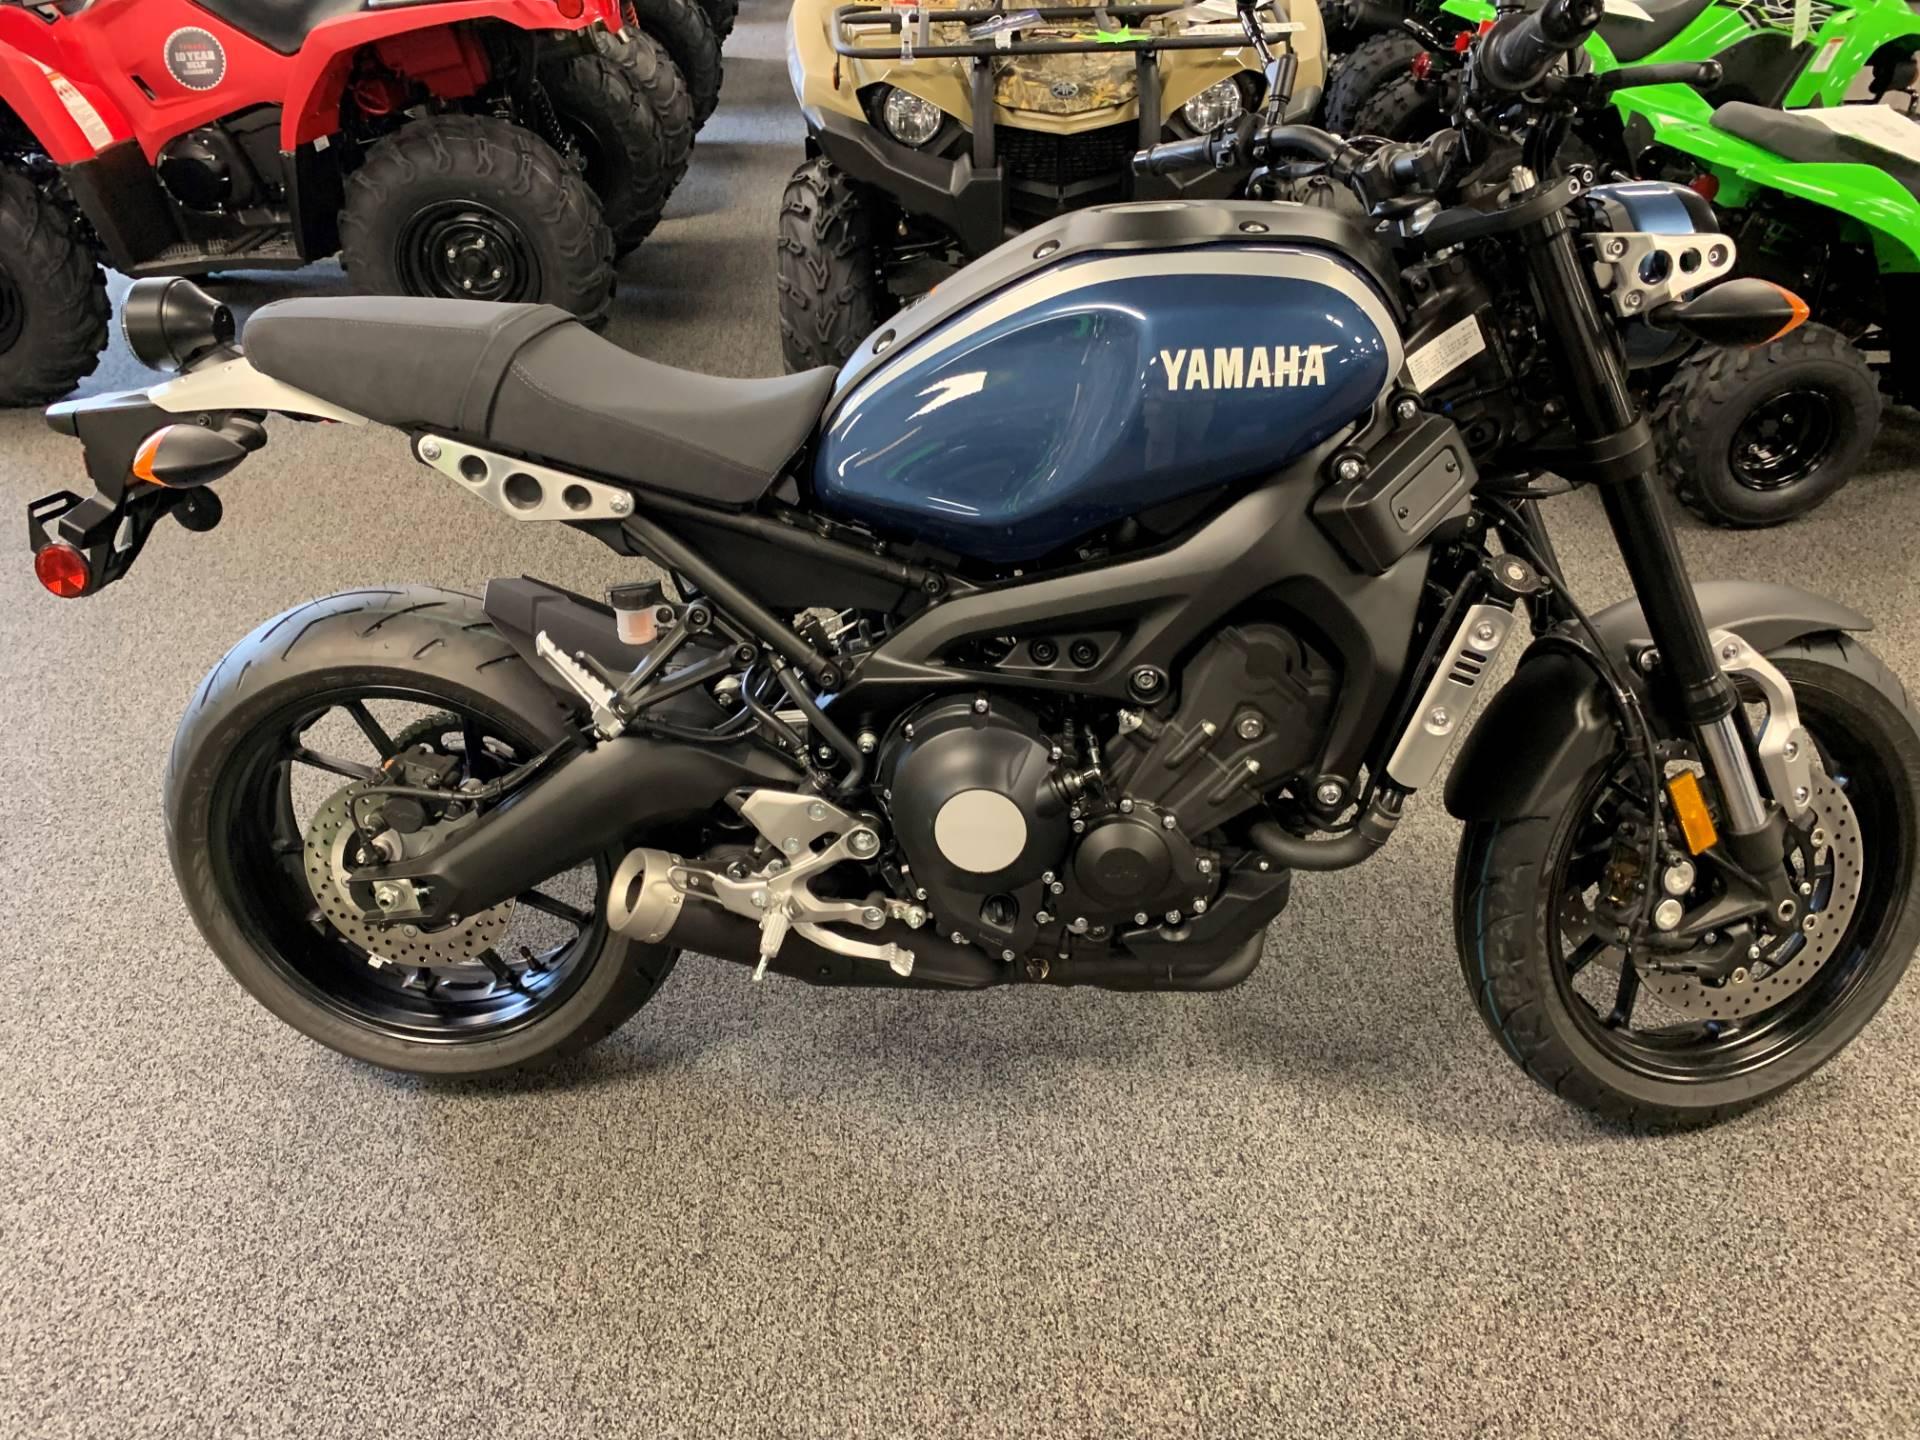 2017 Yamaha XSR900 for sale 38584